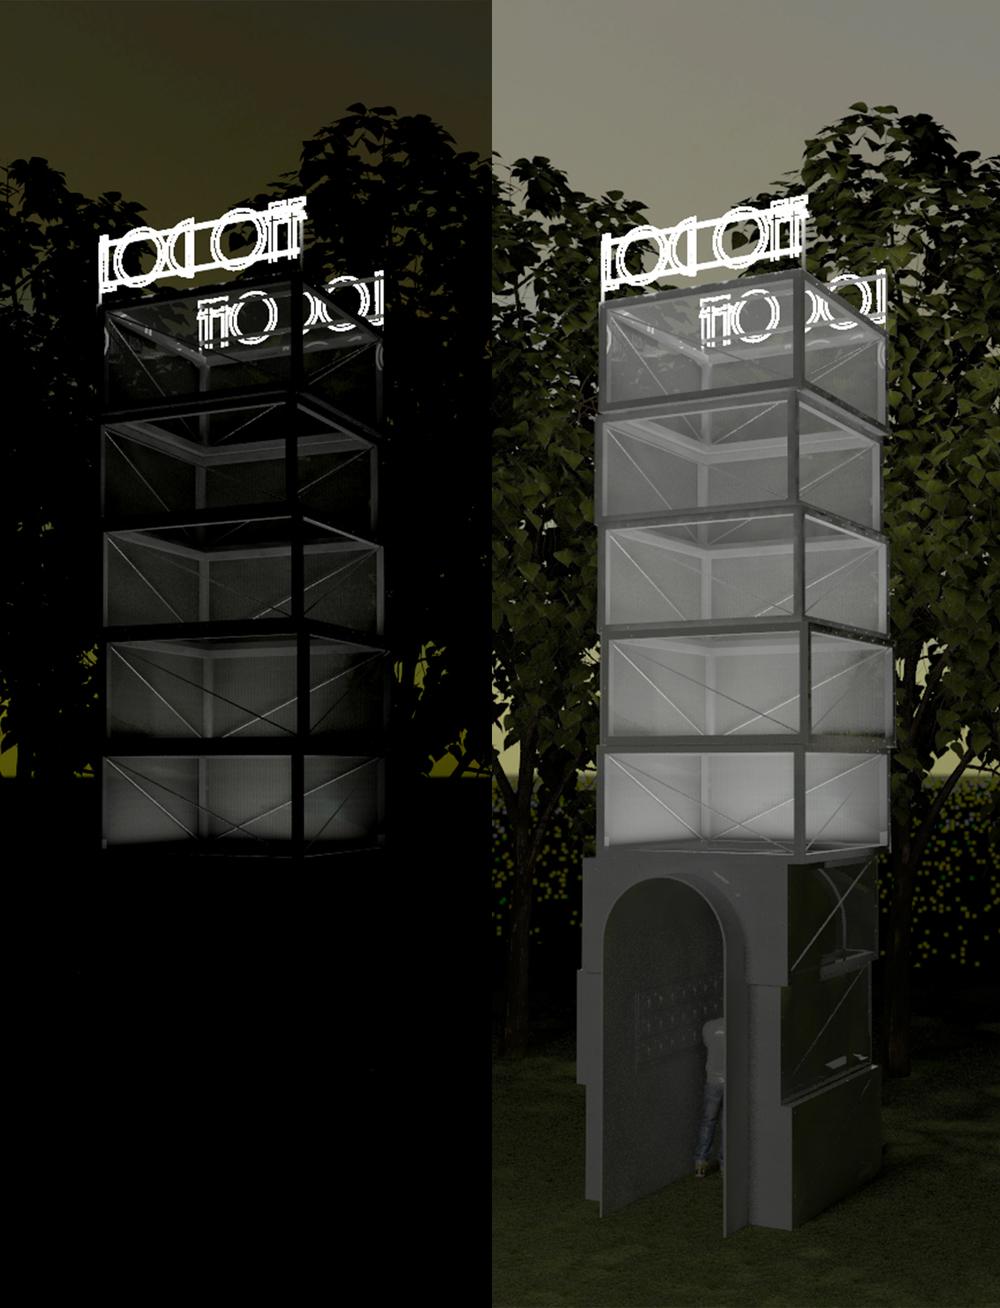 Logoff - Image 5.jpg